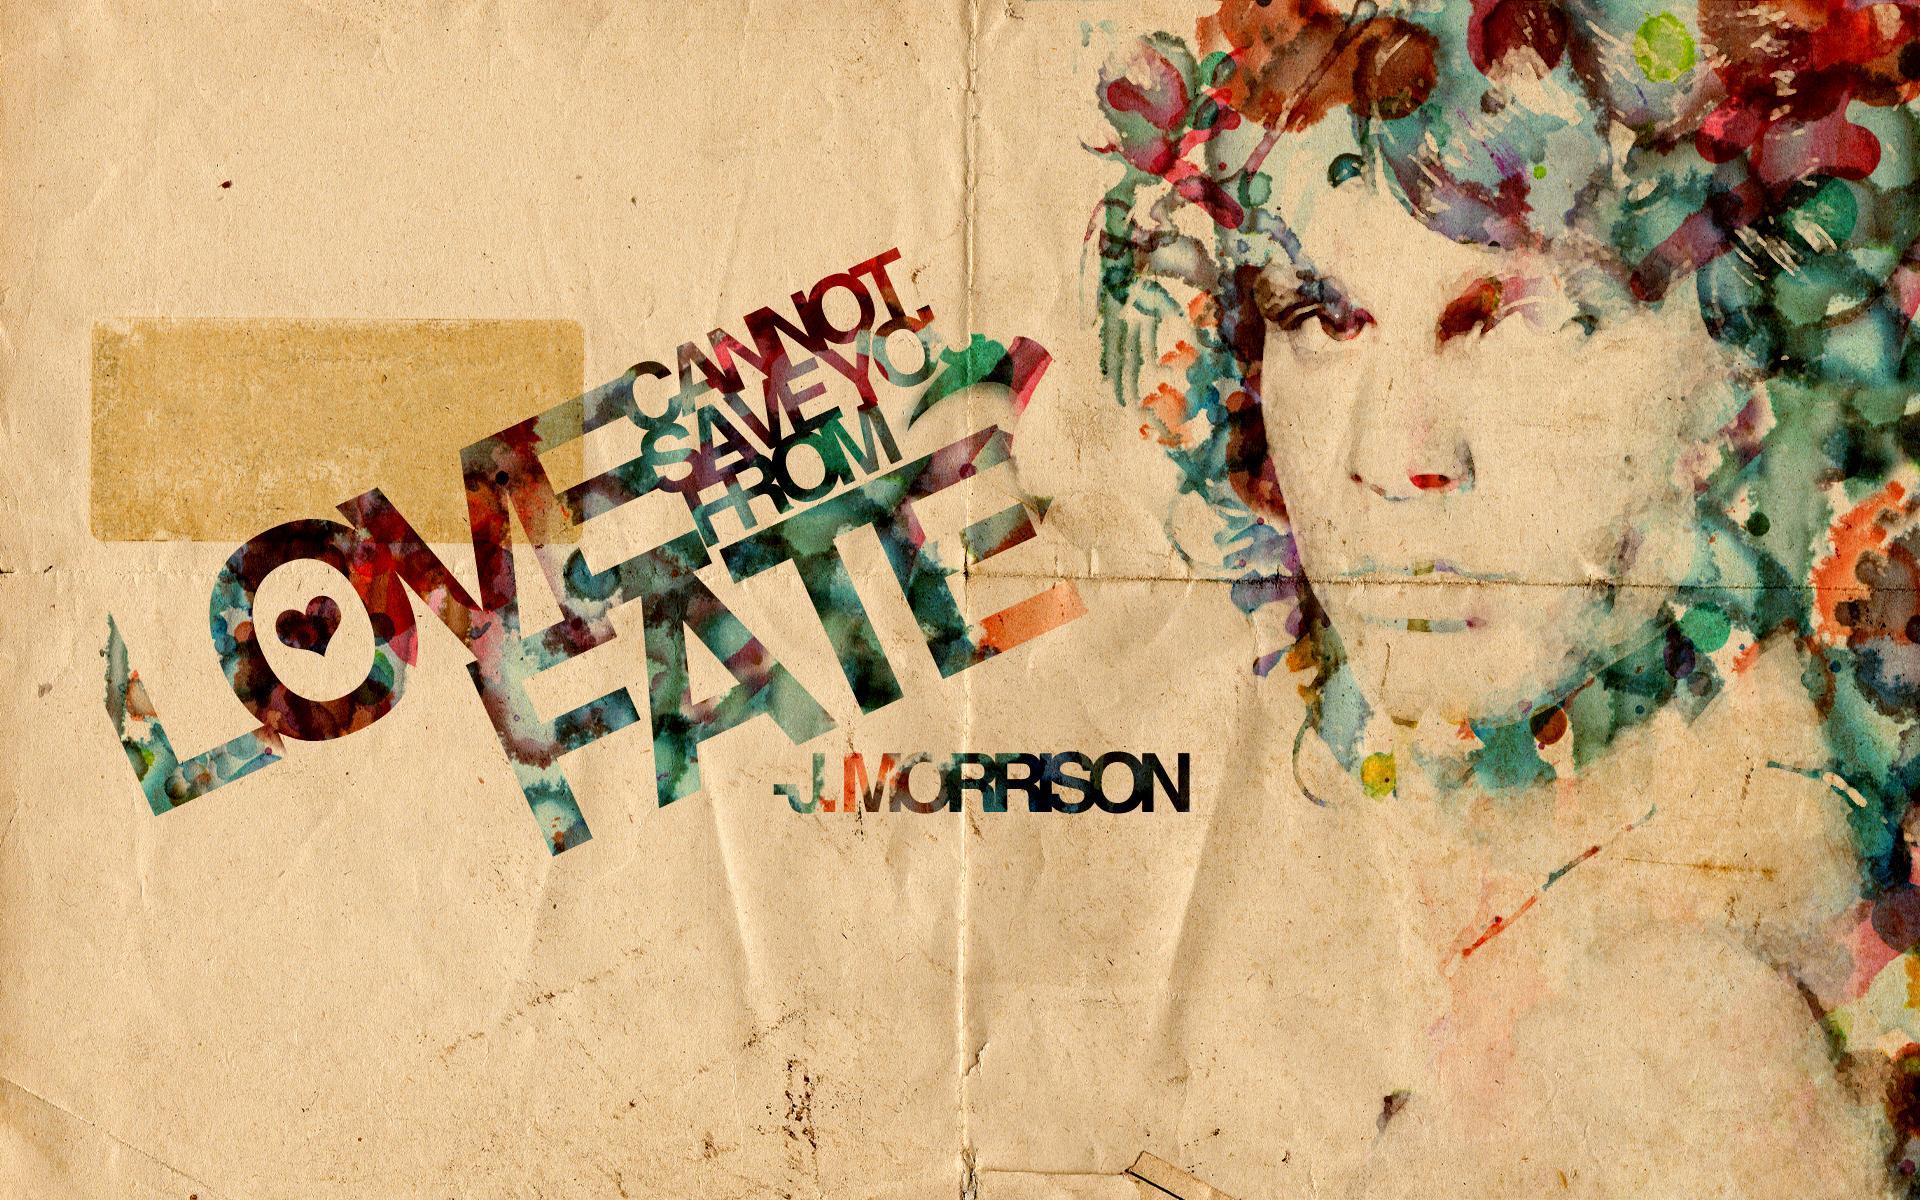 Jim Morrison Art Wall Paper , HD Wallpaper & Backgrounds